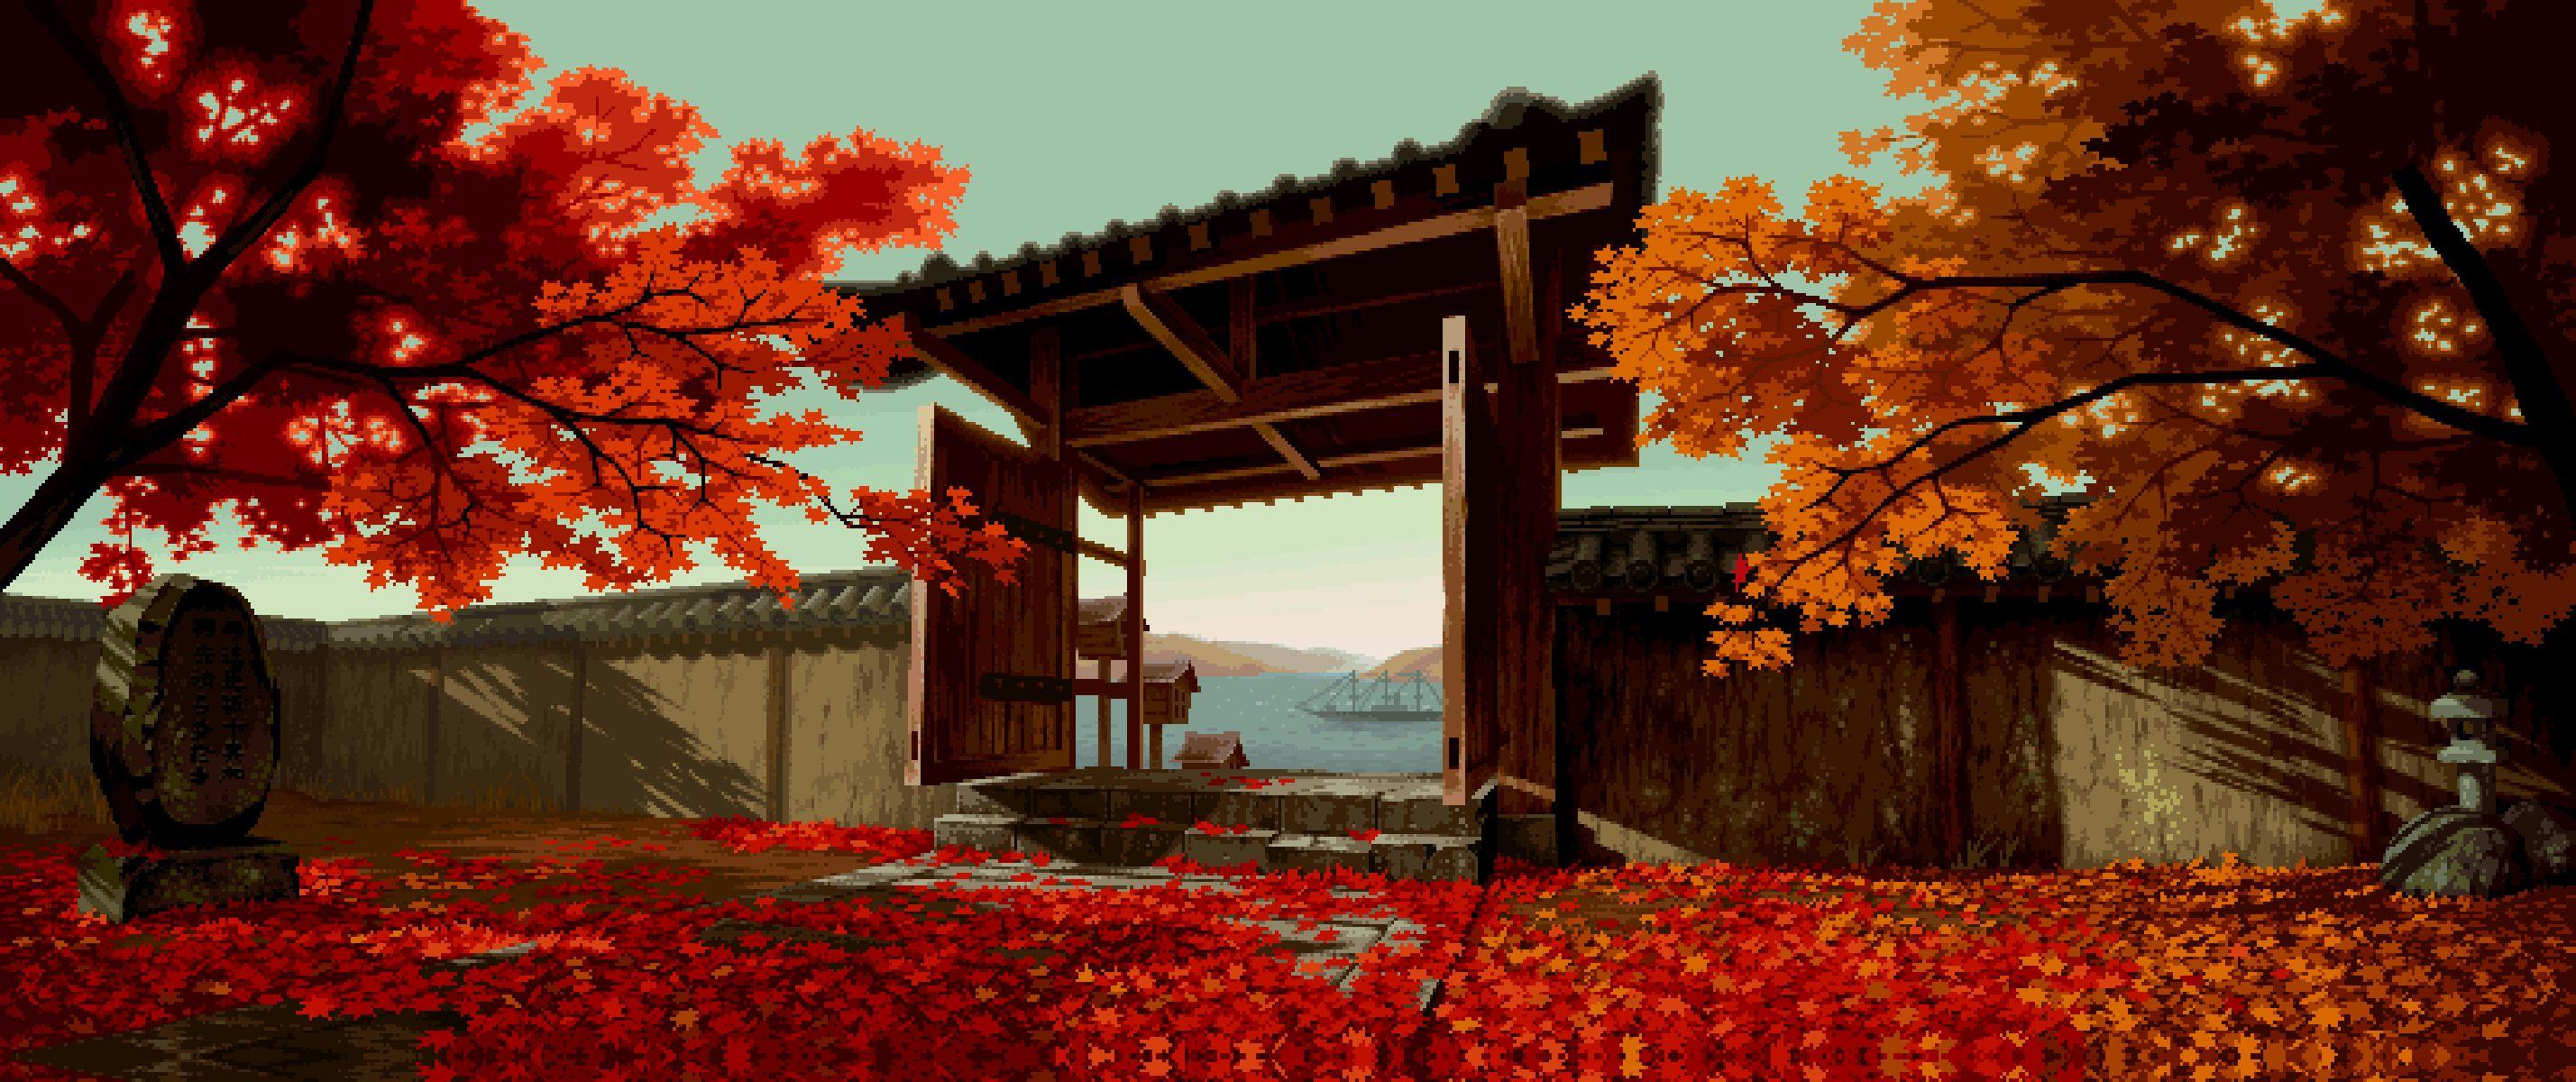 anime scenery fall wallpaper Pixel art, Anime sahnesi